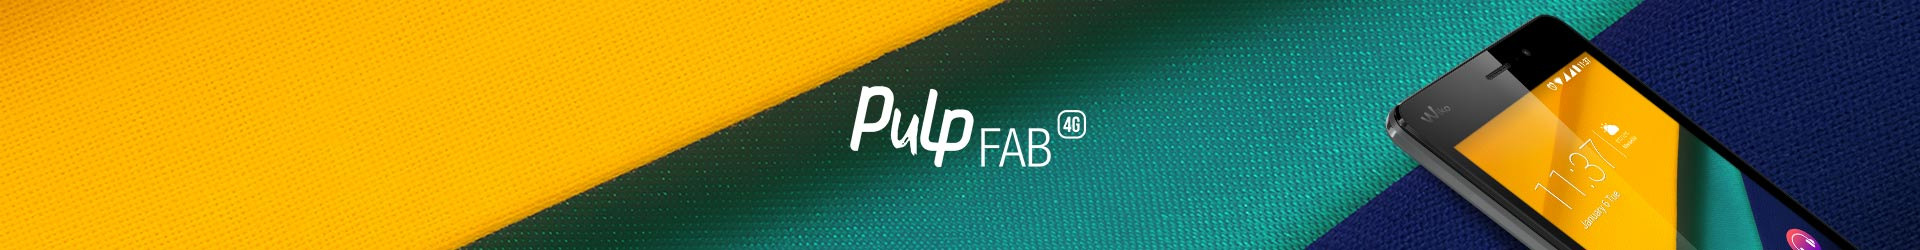 pulp_fab_4g